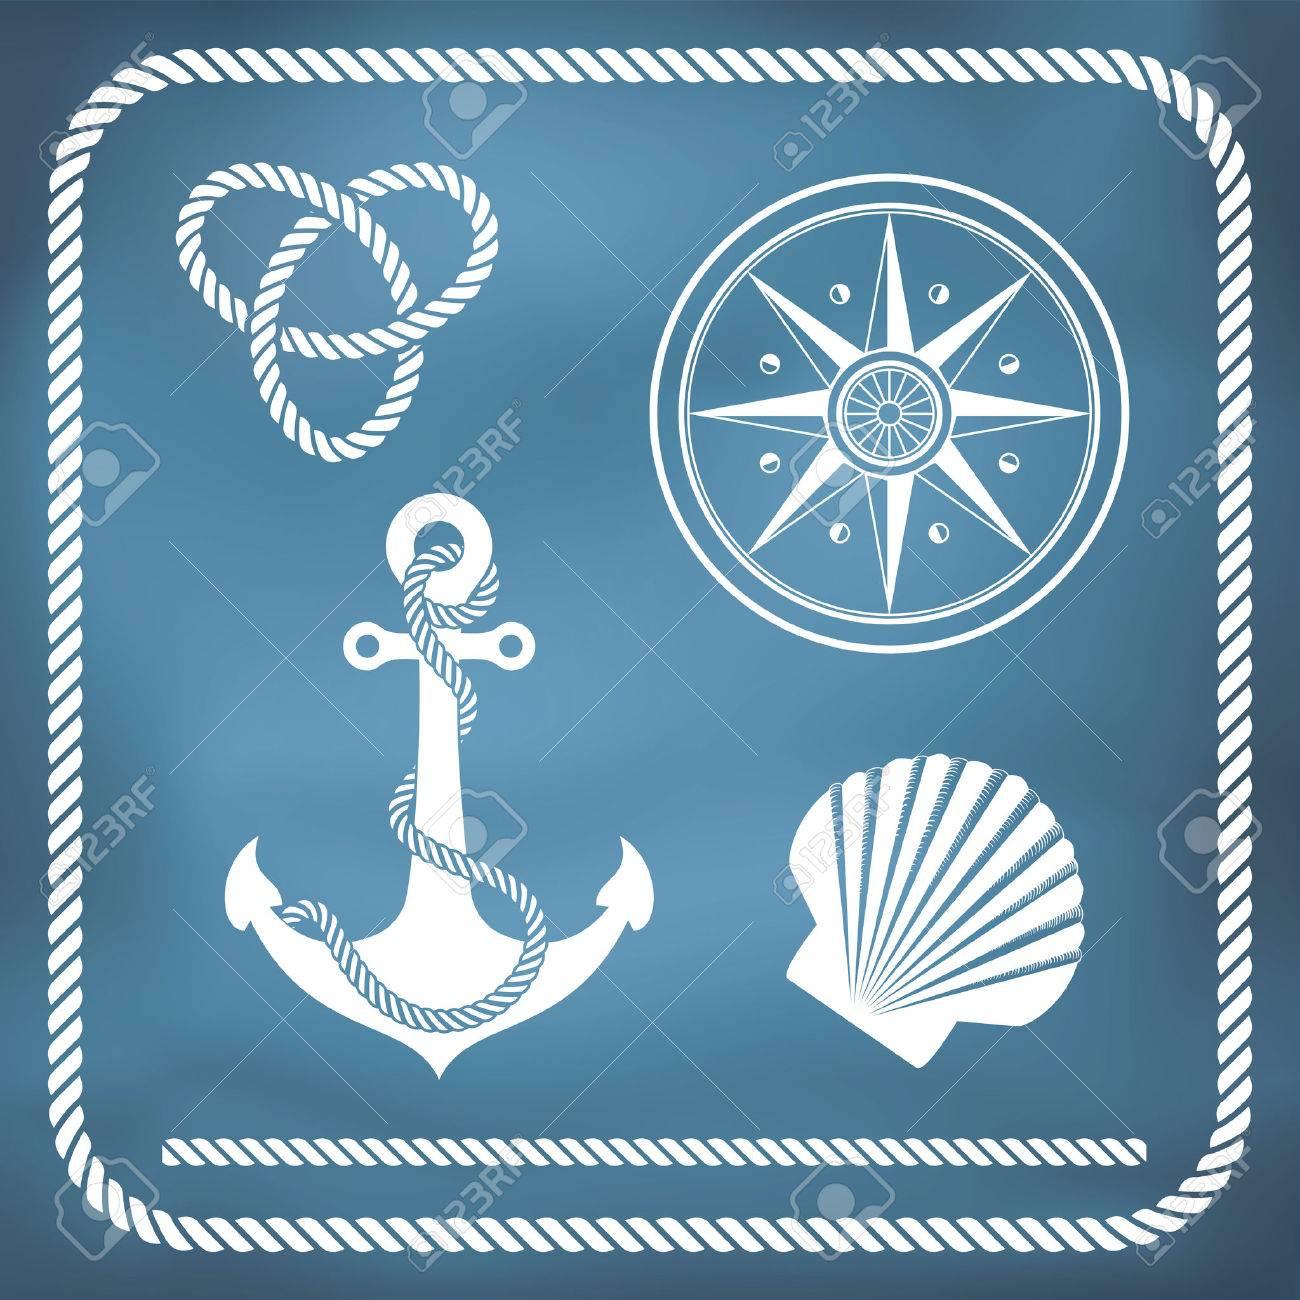 Nautical symbols - compass, anchor, rope knot, shell - 27321453